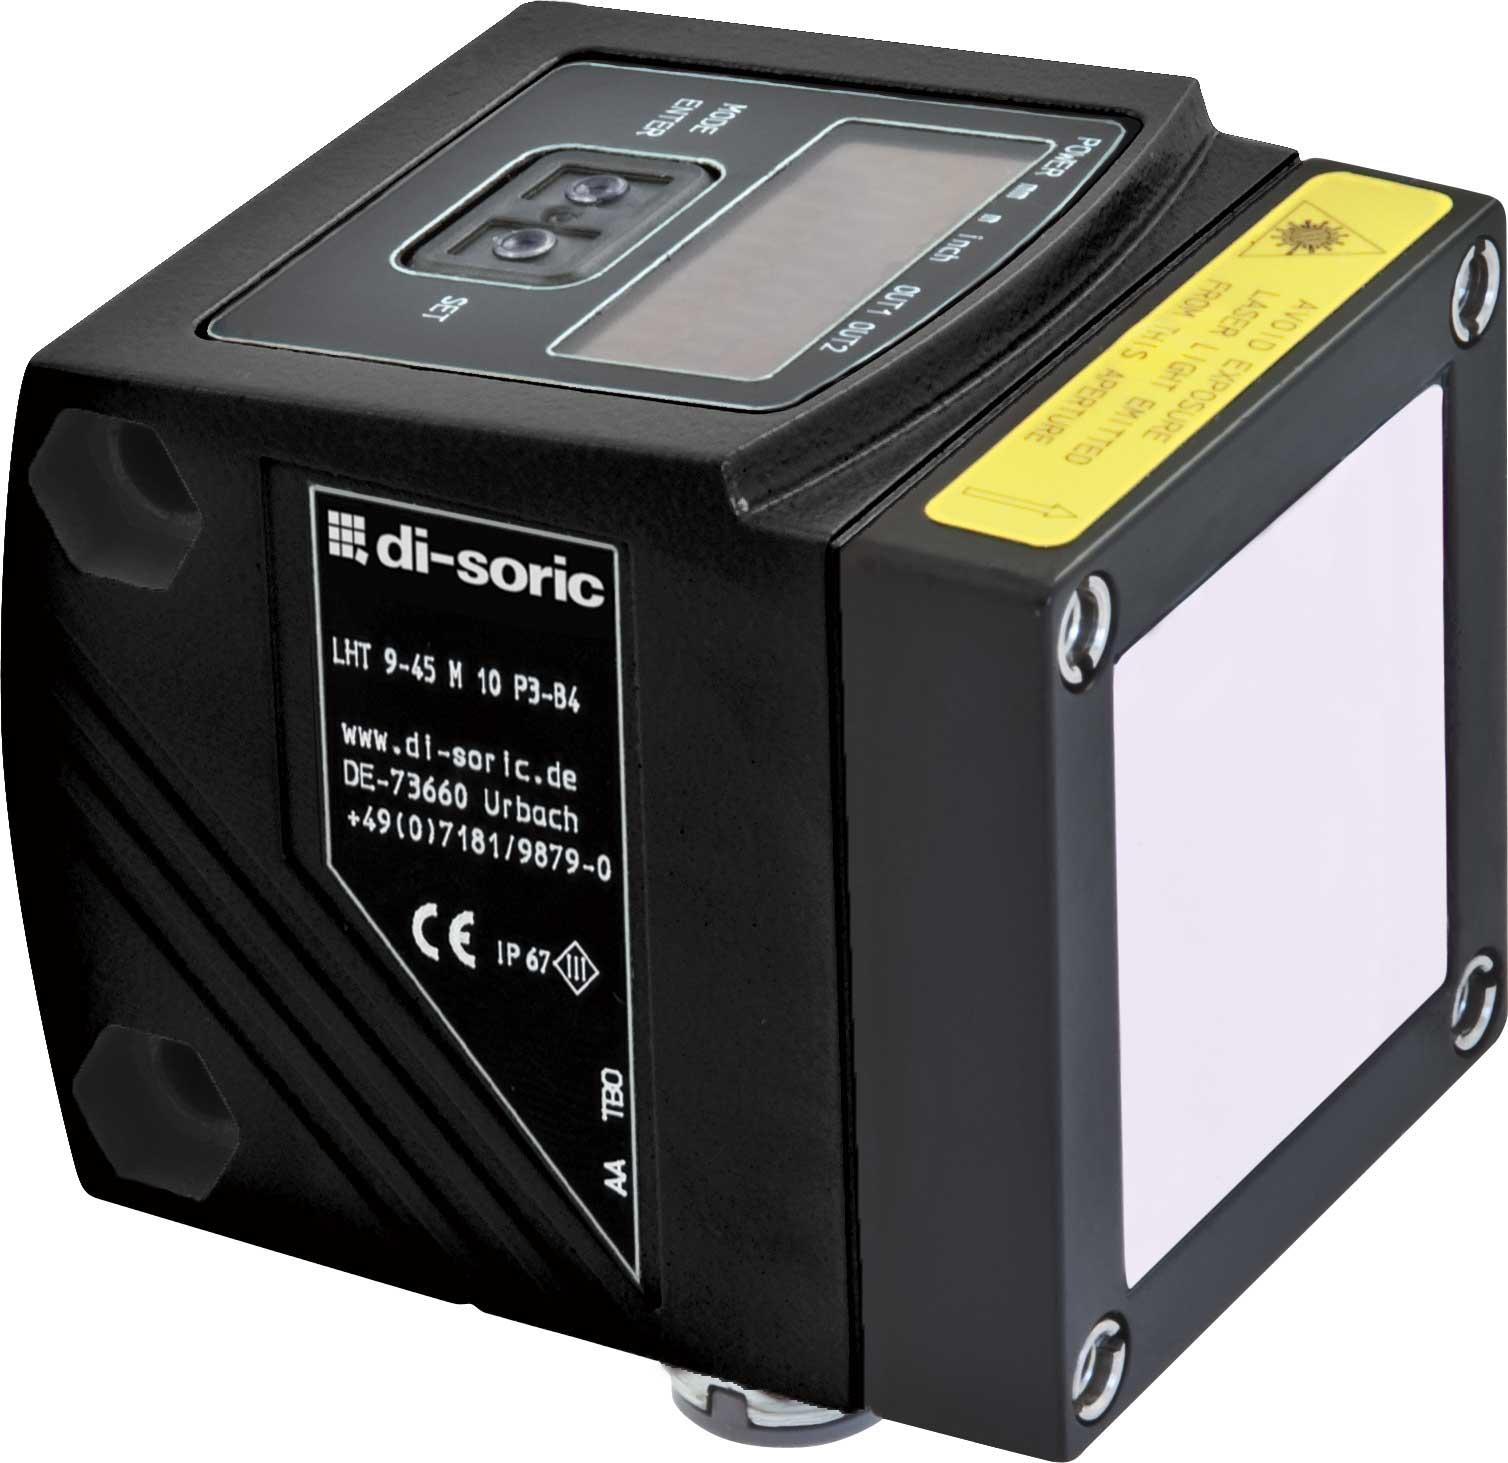 Sensor-de-distancia-laser---LHT-9-45-M-10-P3-B4